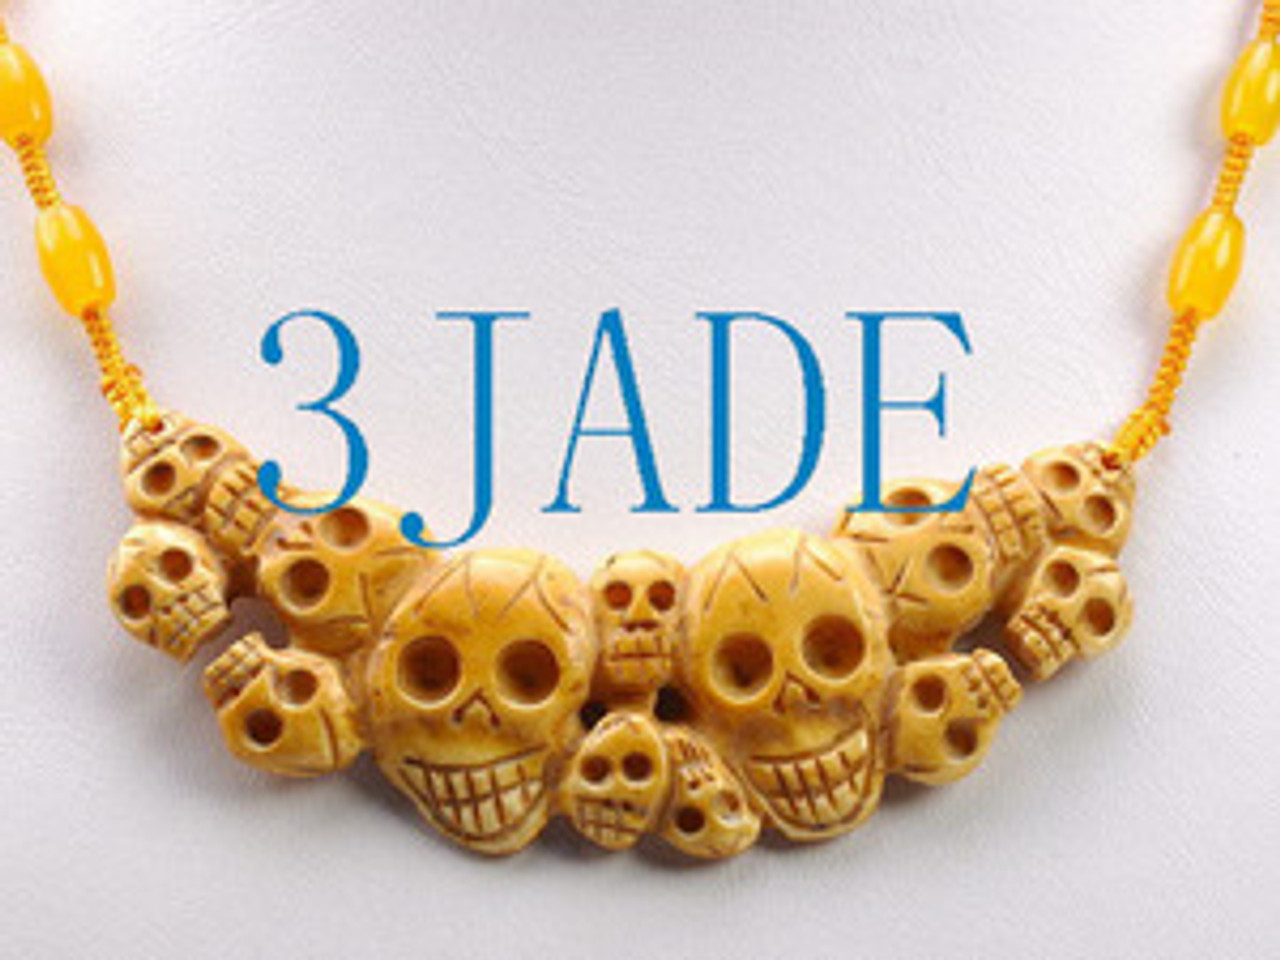 Tibetan Hand Carved Bone Skulls Pendant Necklace 33 3jade Wholesale Of Jade Carvings Jewelry Collectables Prayer Beads